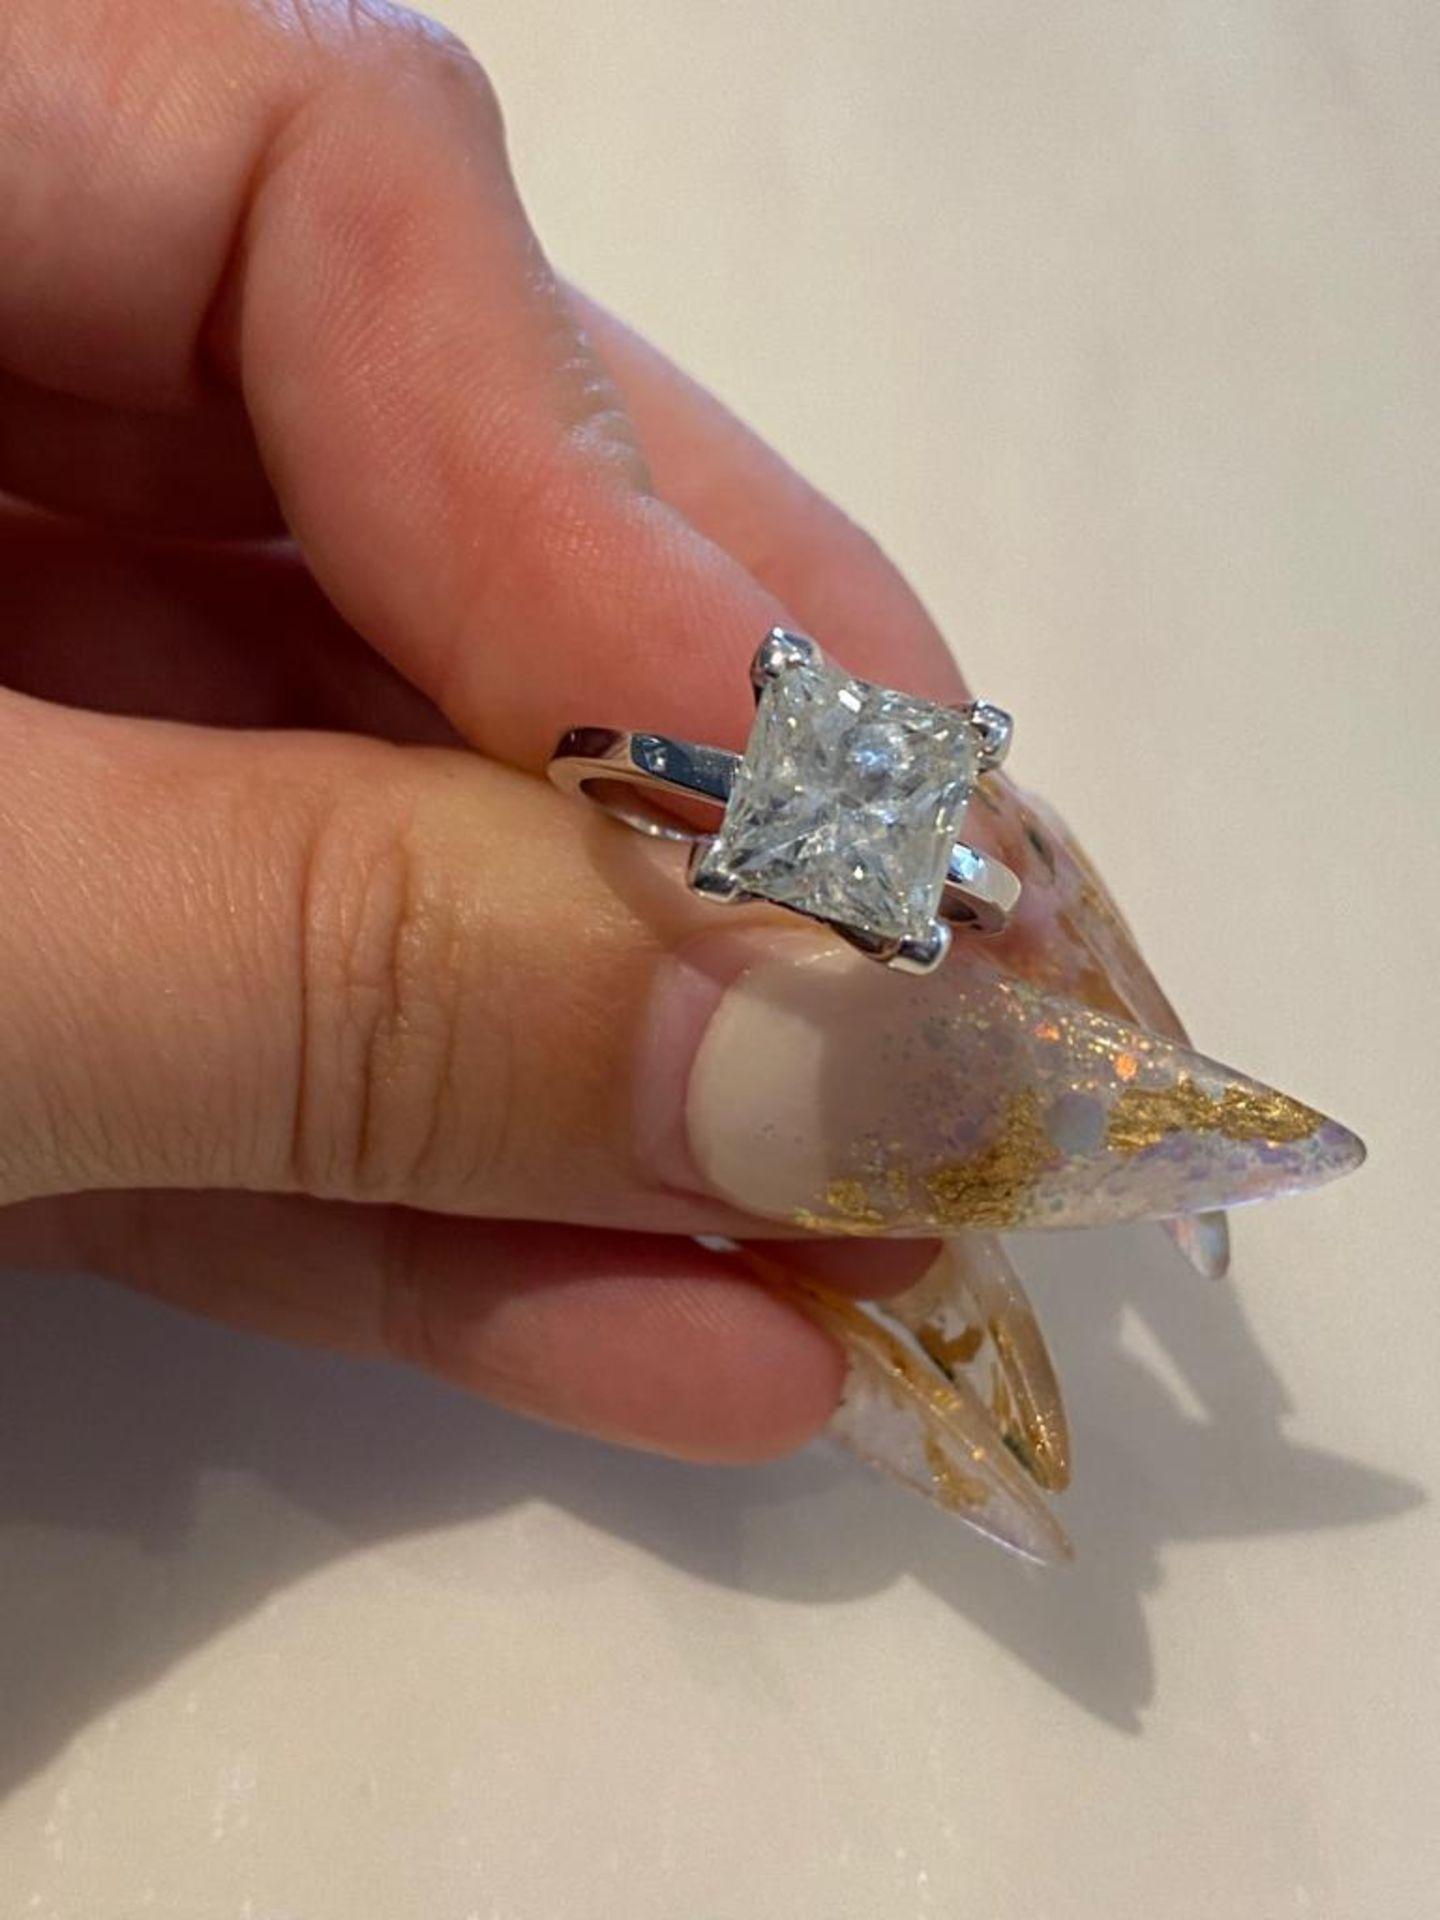 4.03 CT DIAMOND ING PRINCESS CUT - Image 3 of 7